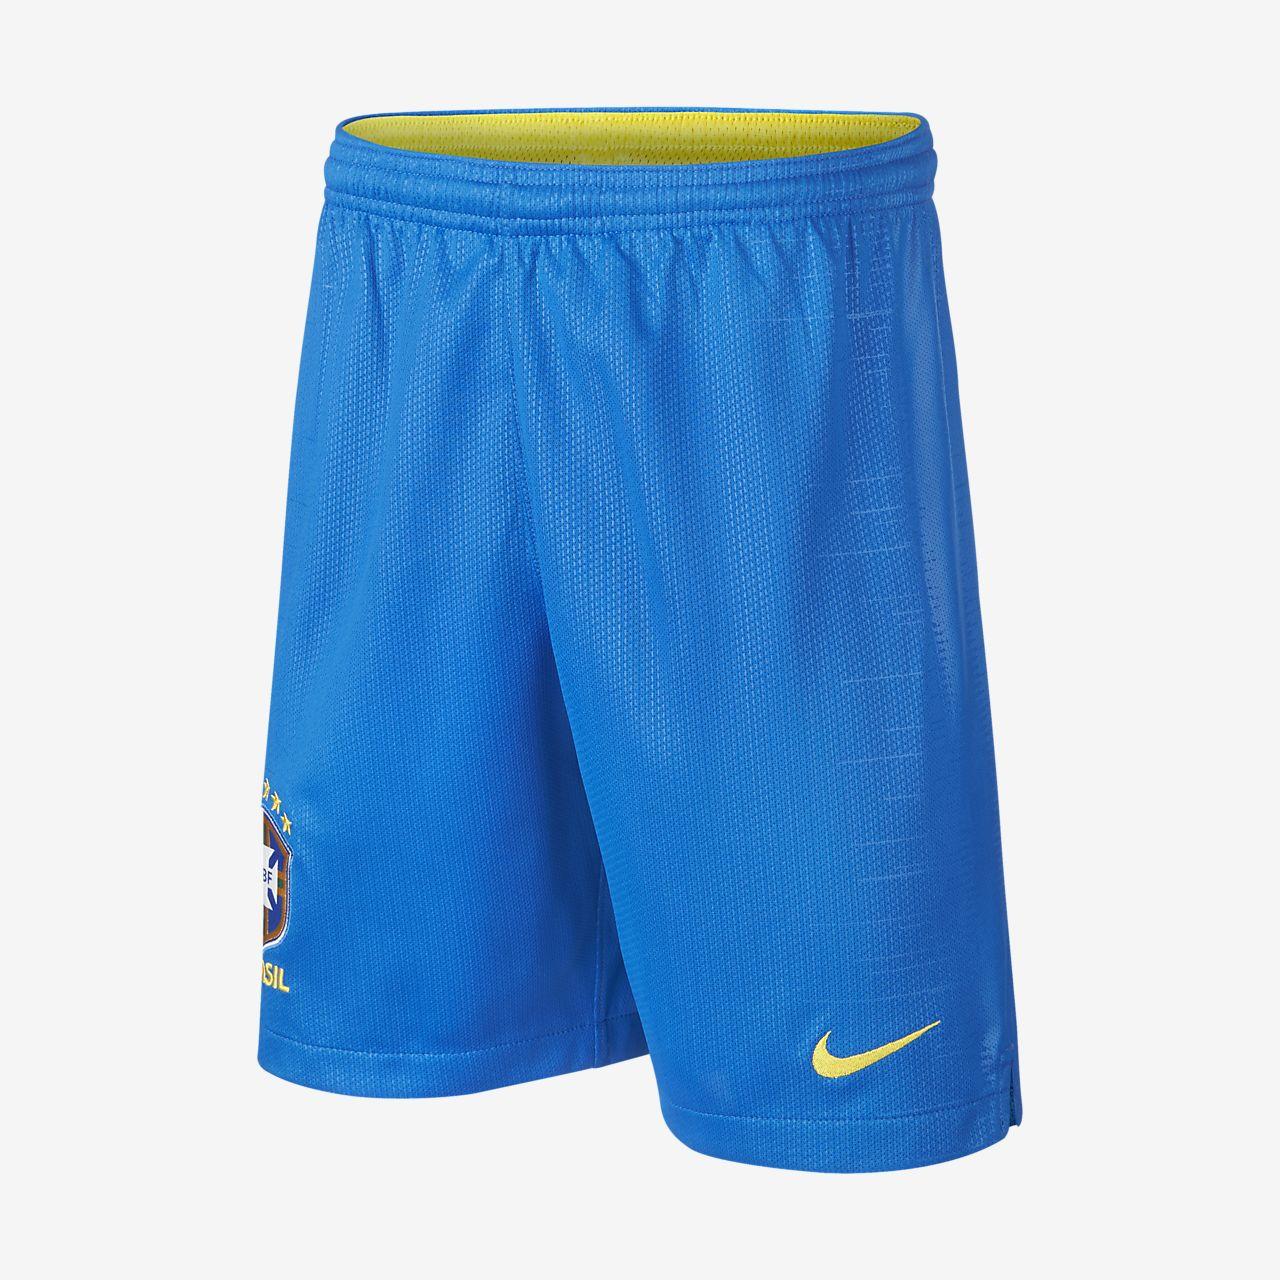 2018 Brasil CBF Stadium Home Pantalons curts de futbol - Nen/a